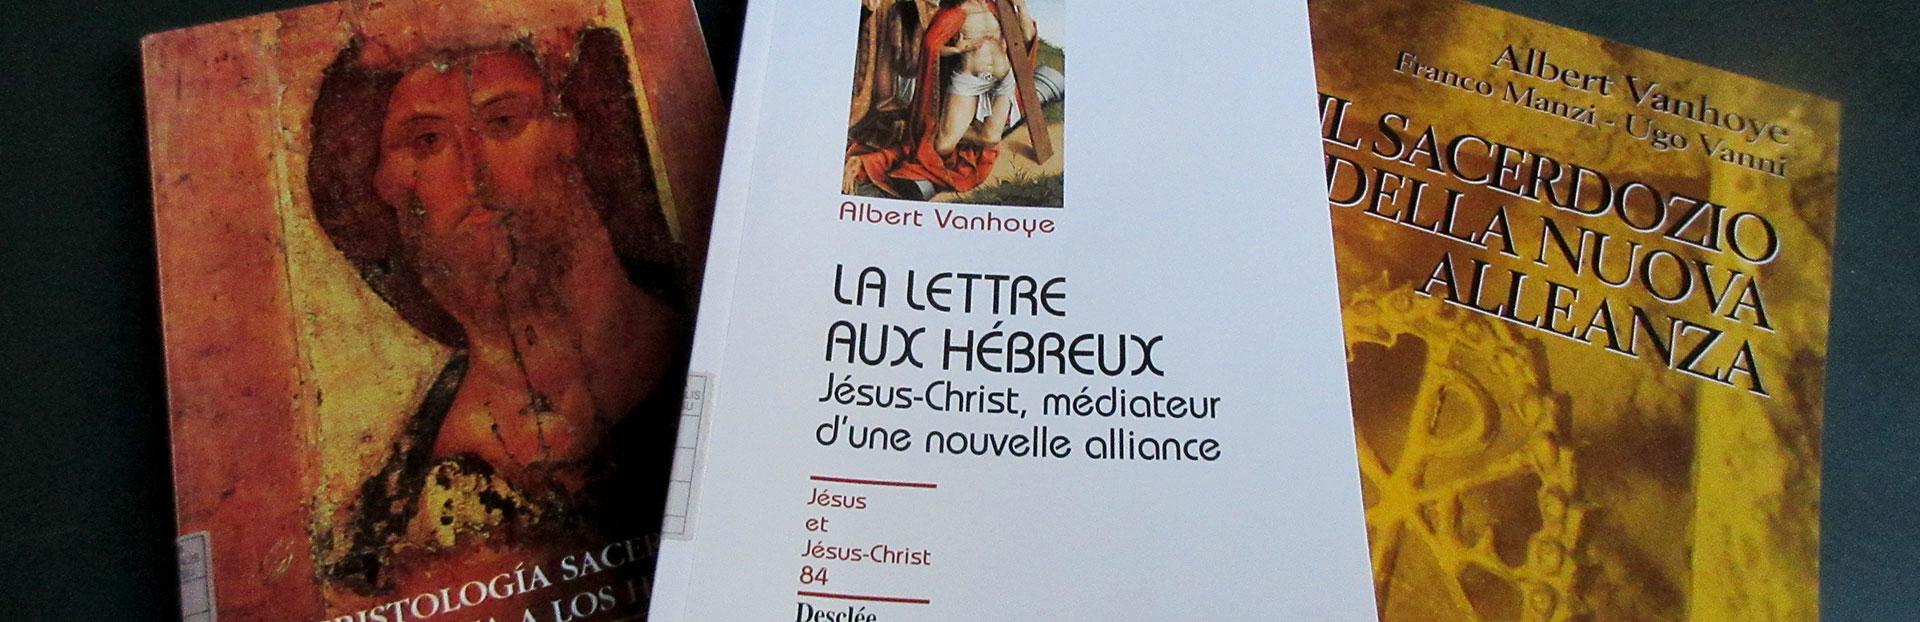 Albert Vanhoye SJ – An Ideal Professor/Guide and a Saintly Magis Jesuit